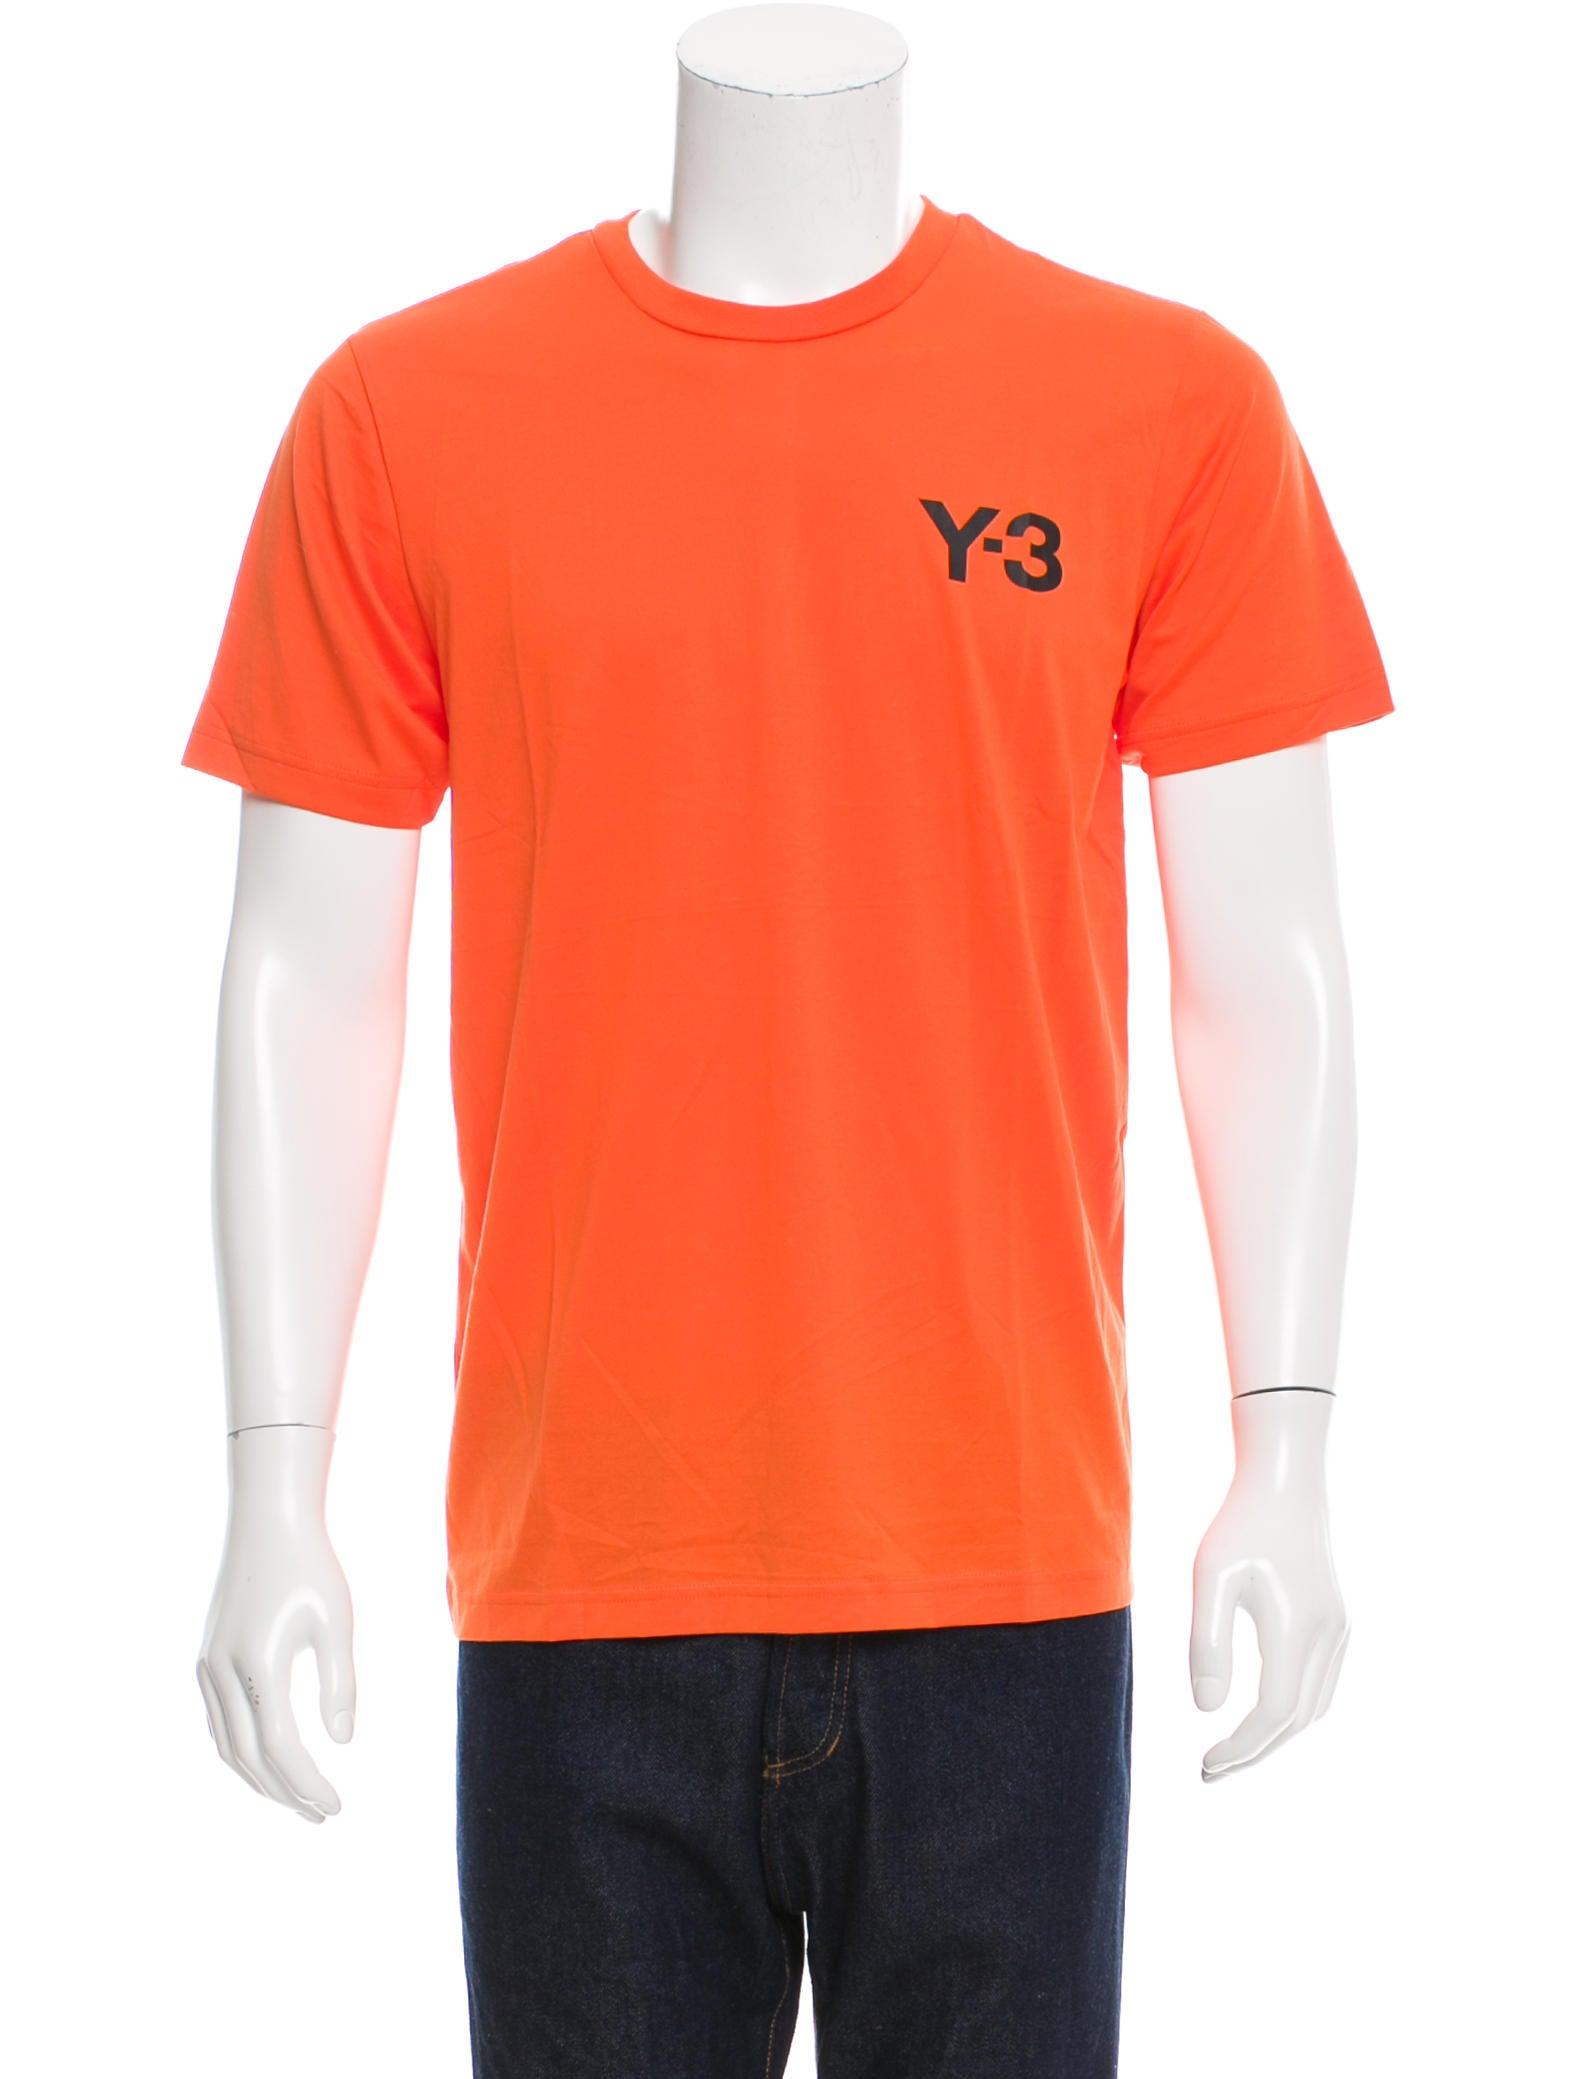 Y 3 X Adidas Logo Printed Short Sleeve T Shirt Clothing